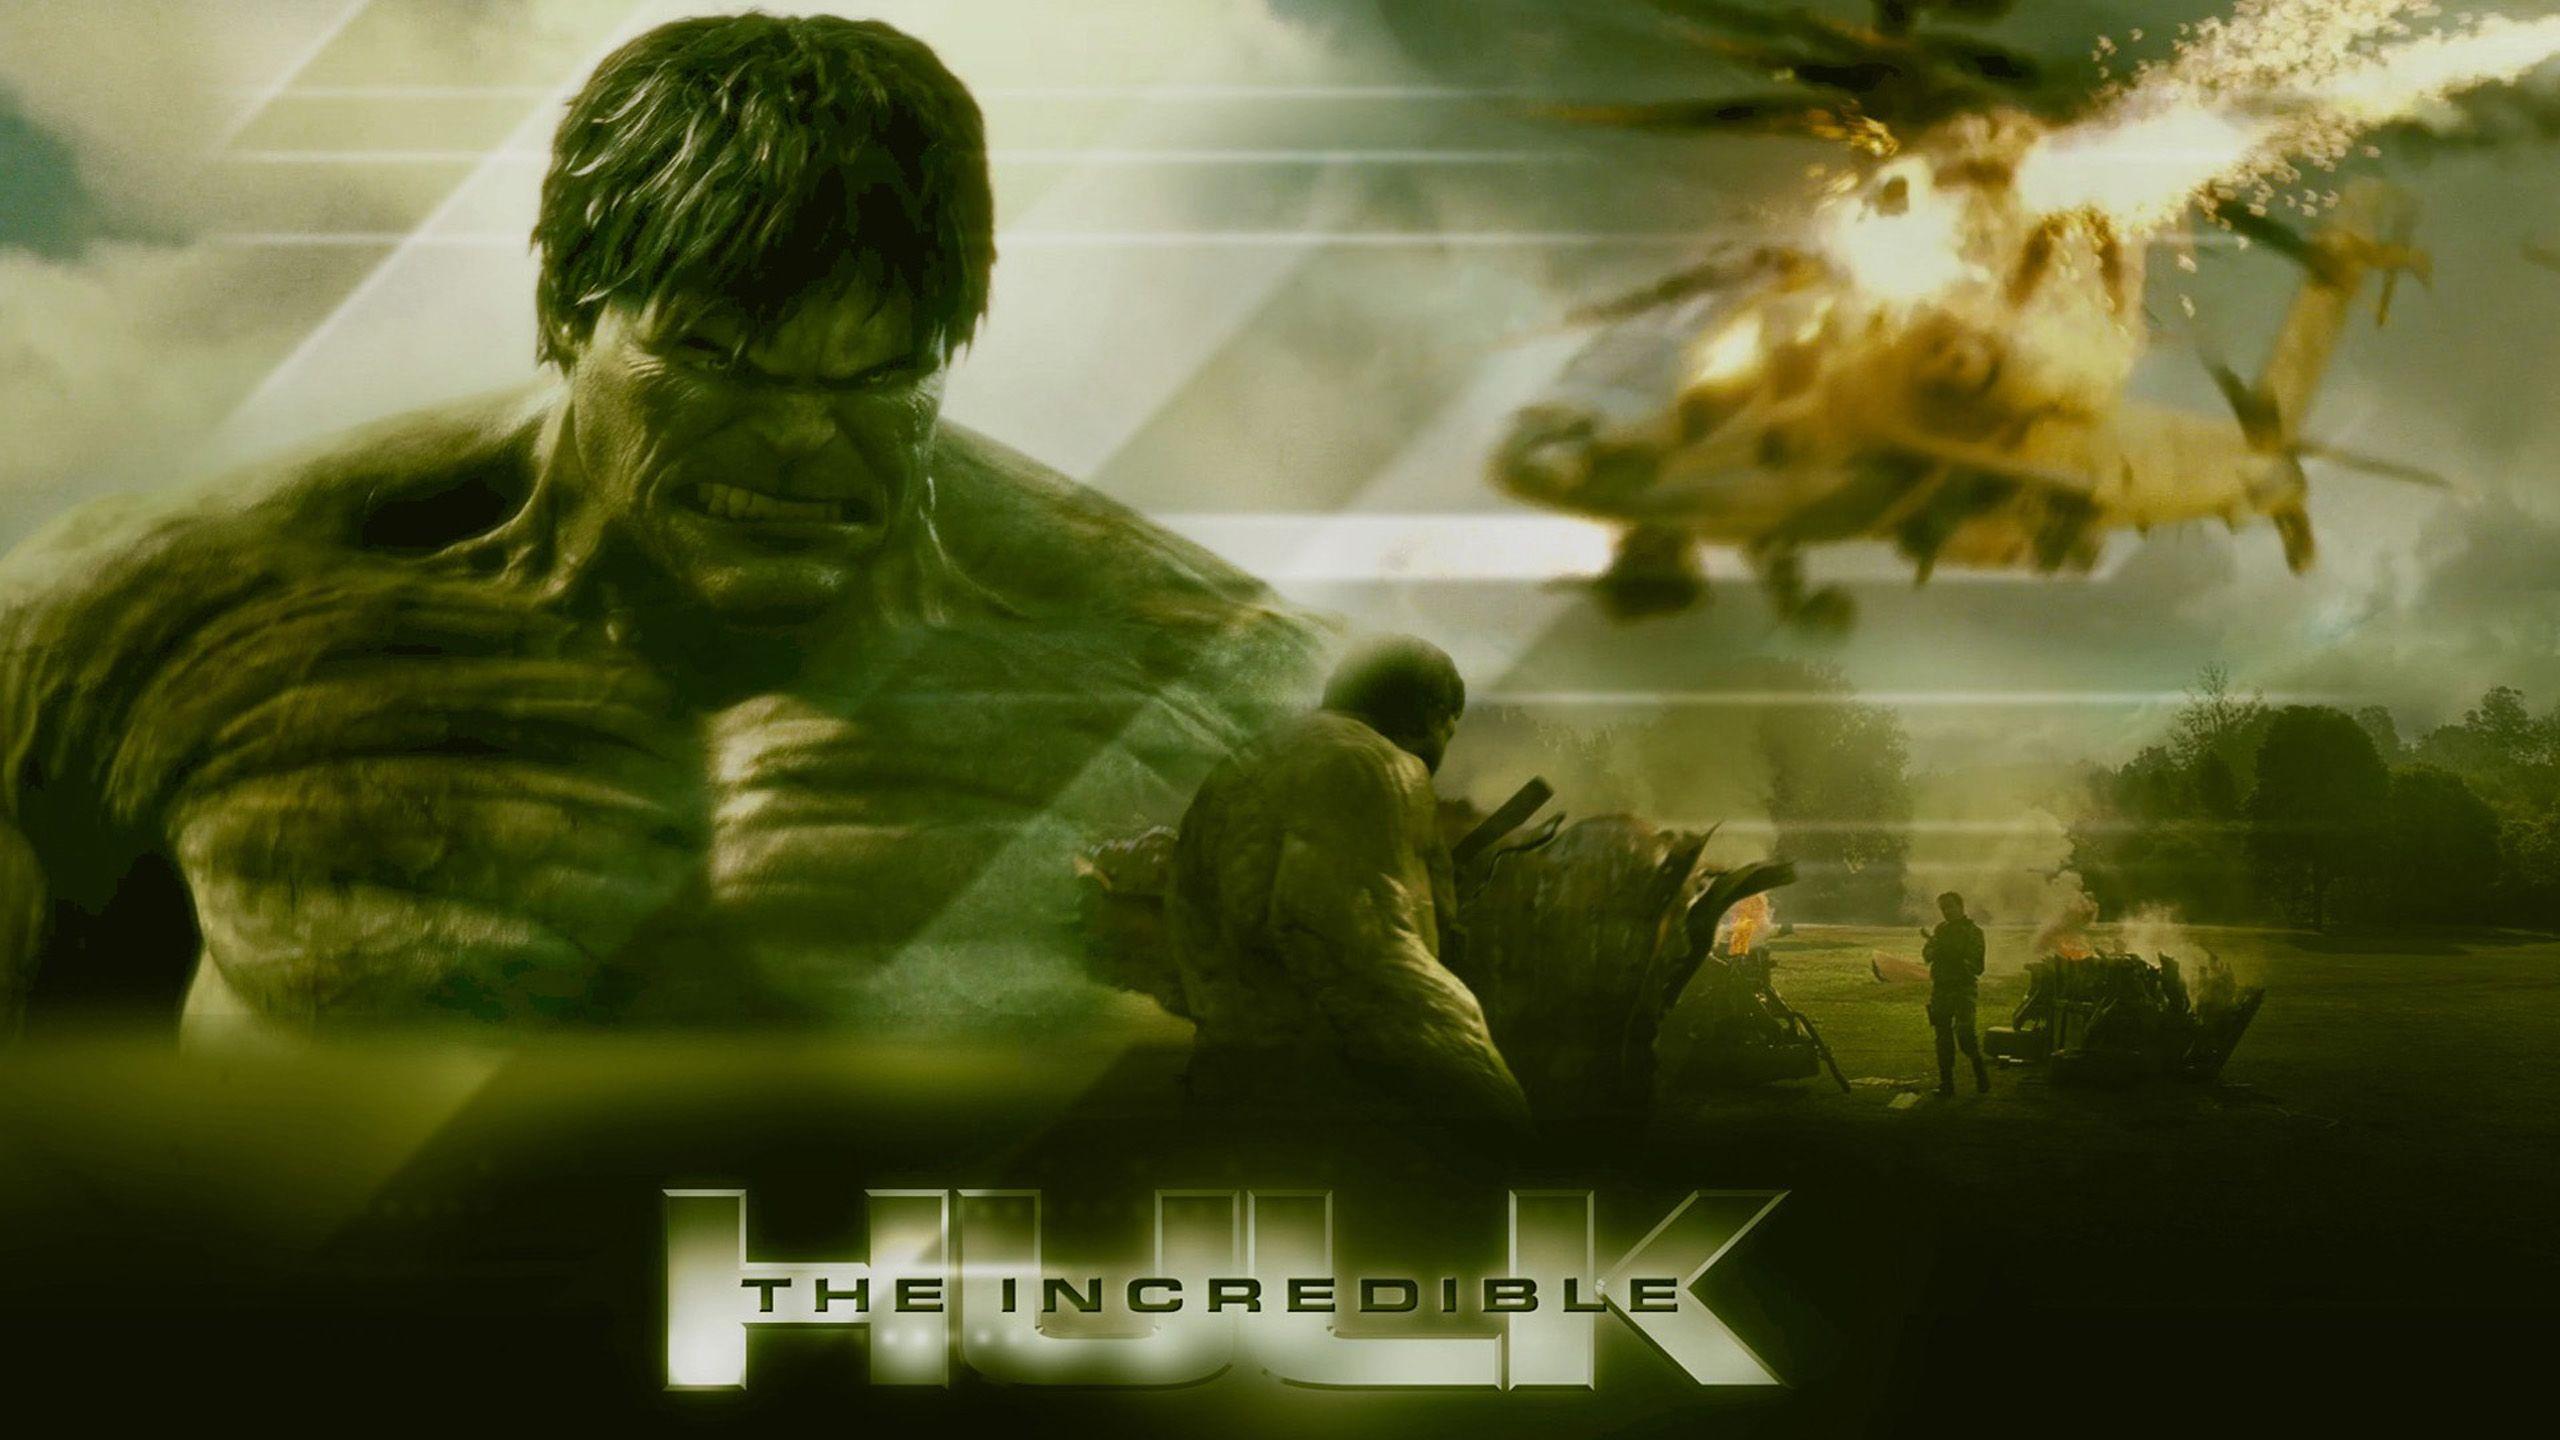 Hulk 2008 Wallpapers Top Free Hulk 2008 Backgrounds Wallpaperaccess